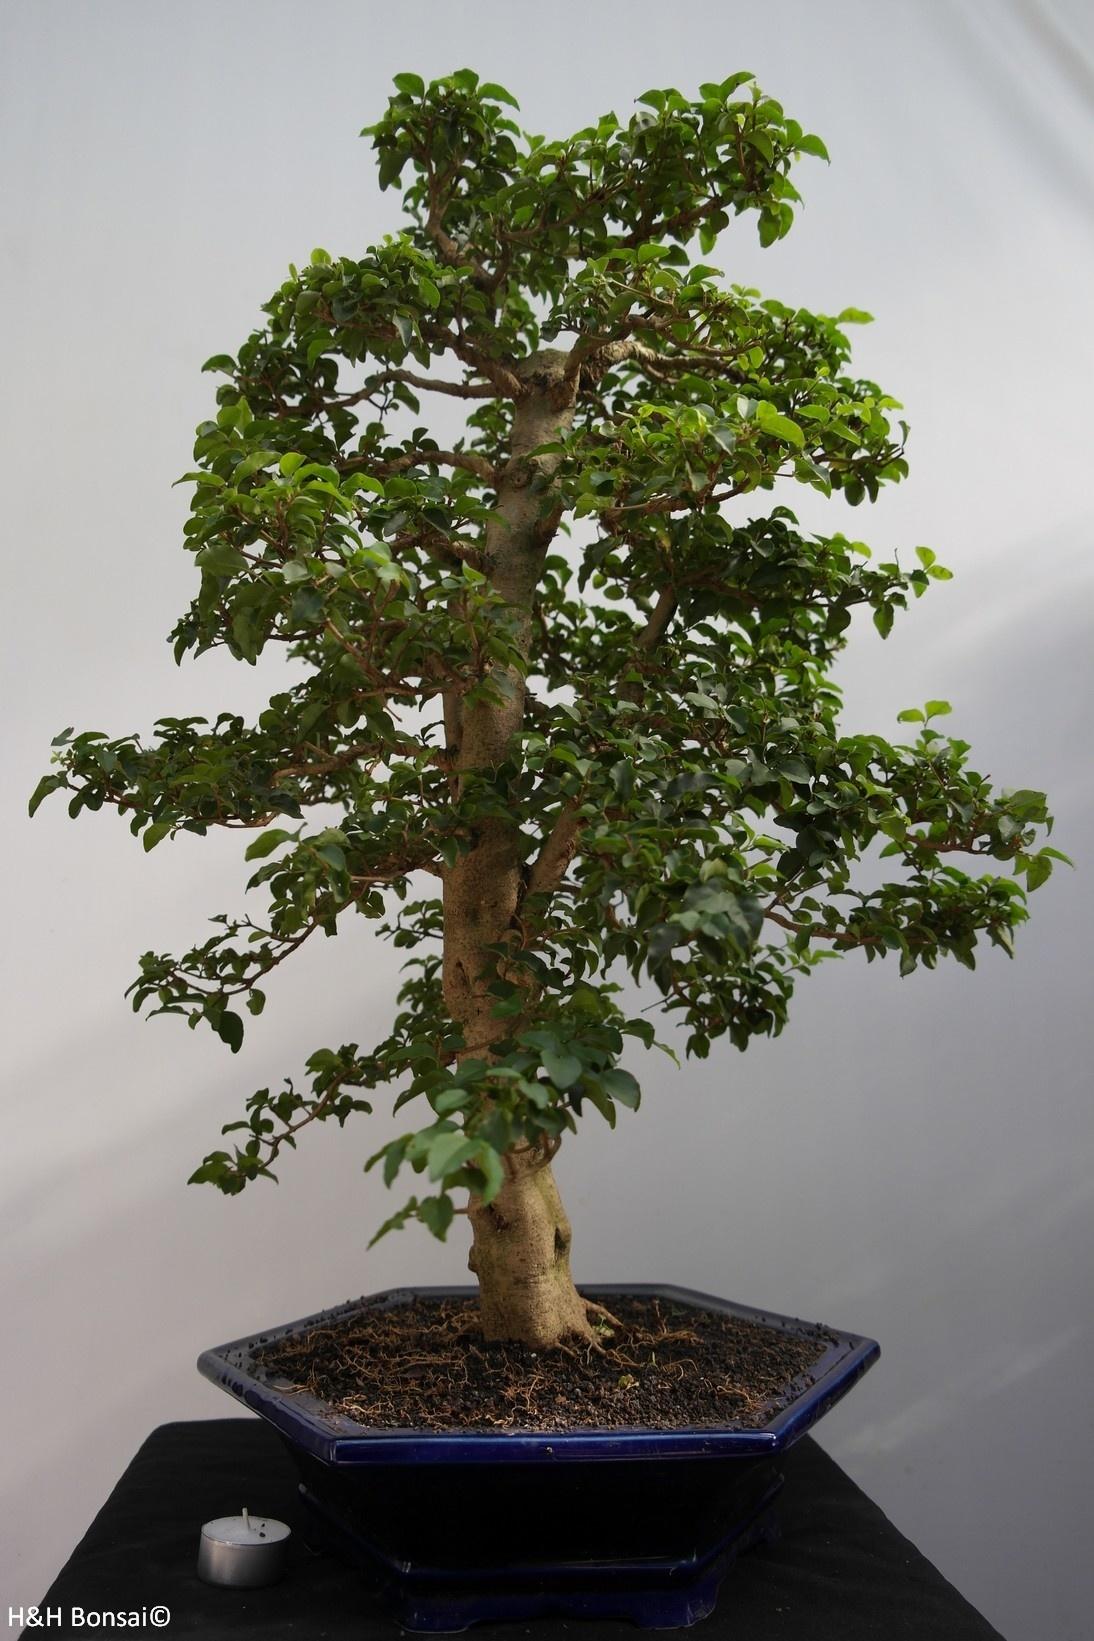 Bonsai Ligustro, Ligustrumsinense, no. 7844